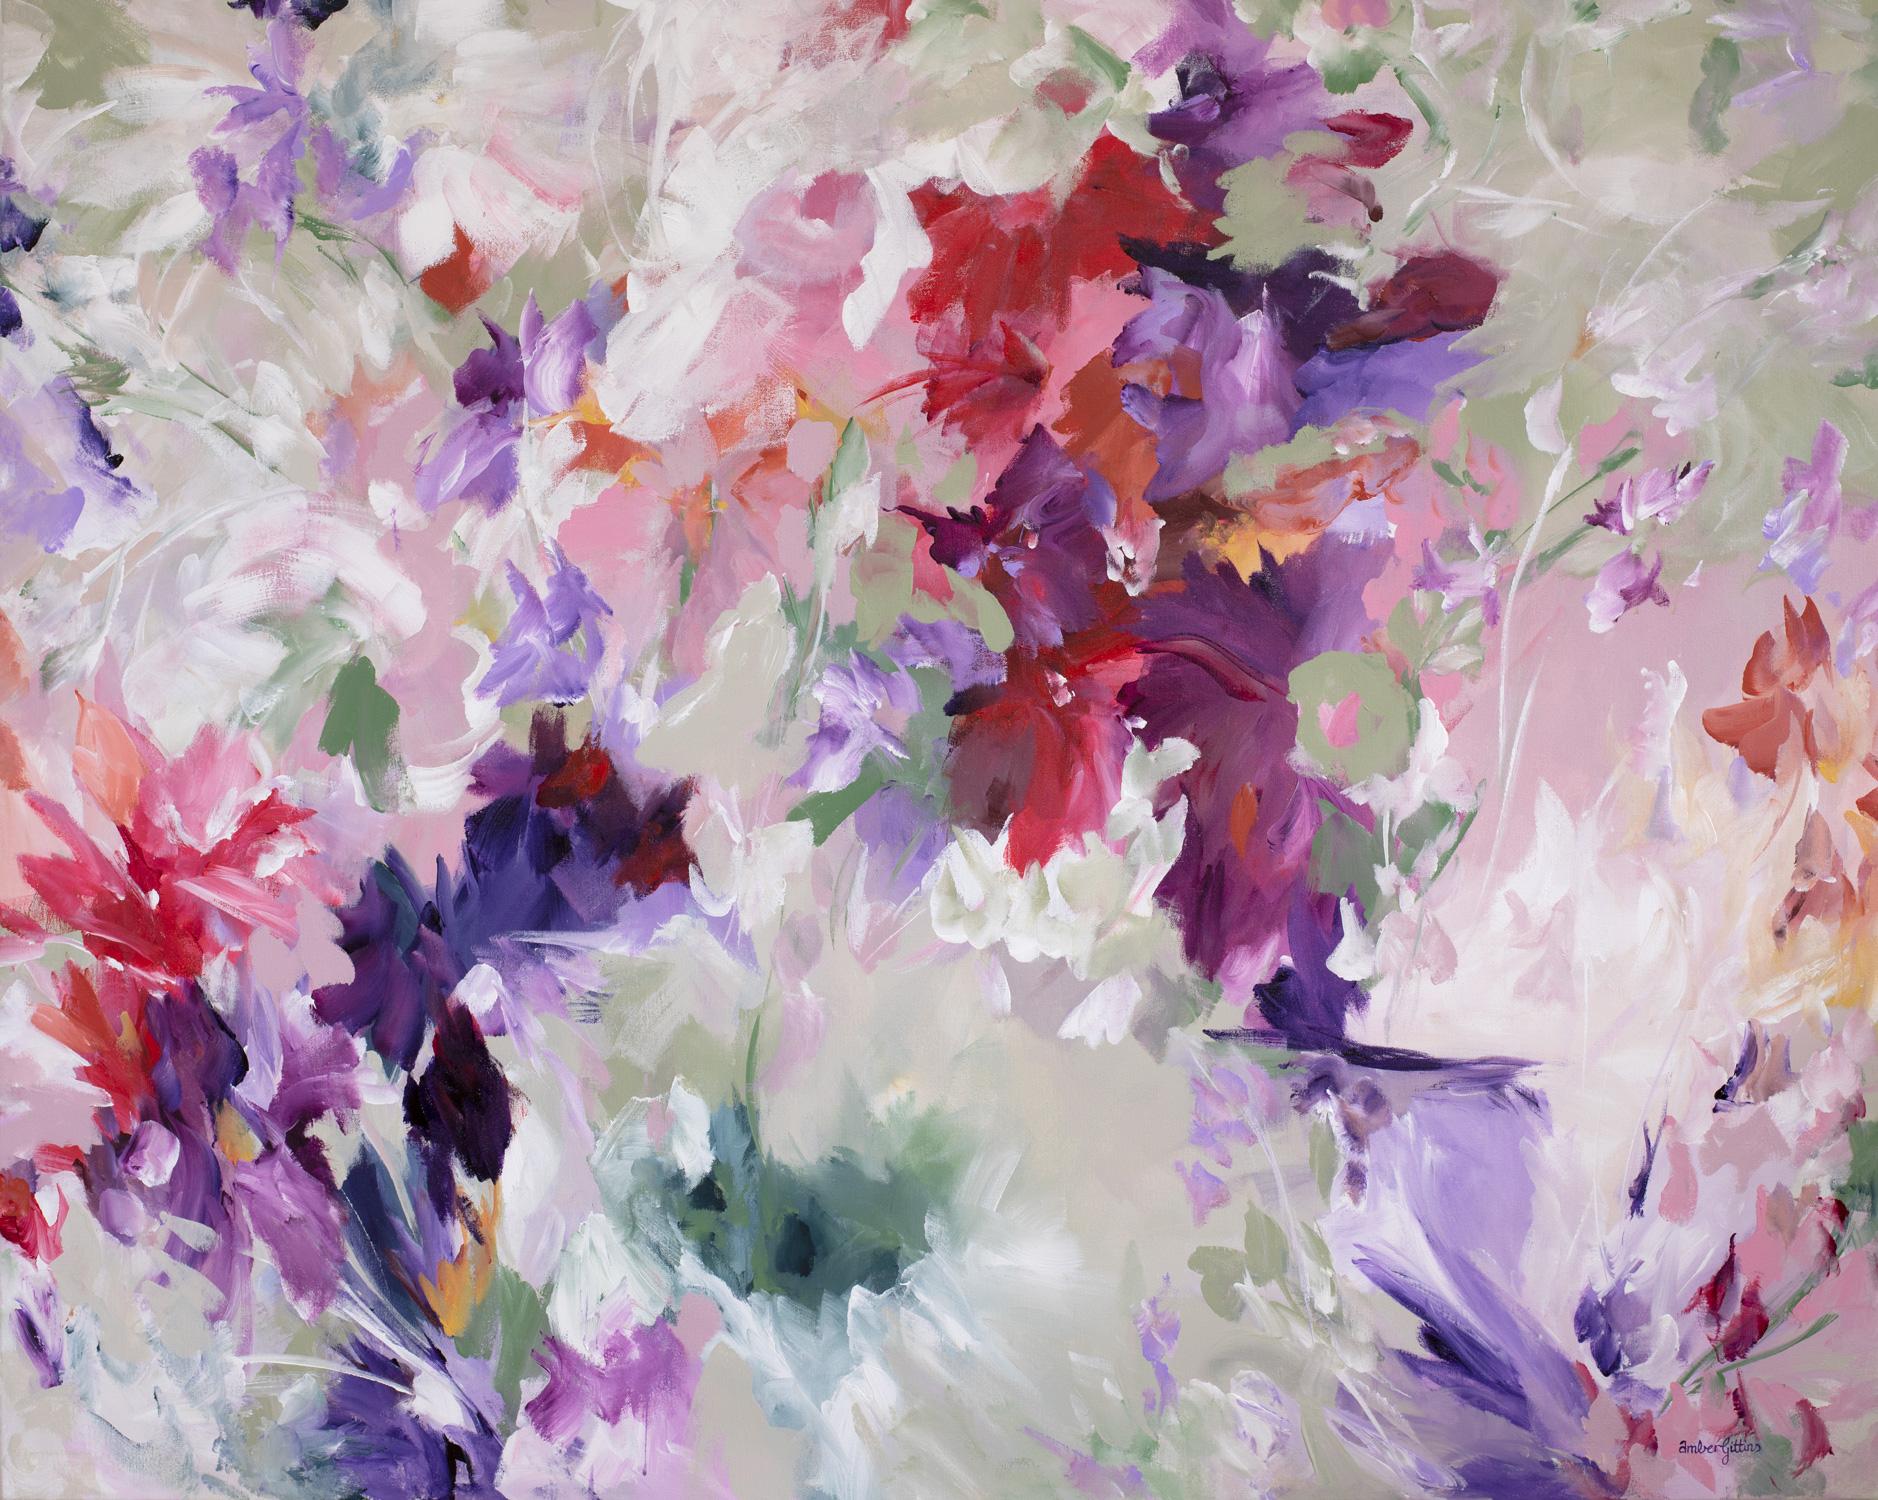 Explosive Blooms By Amber Gittins